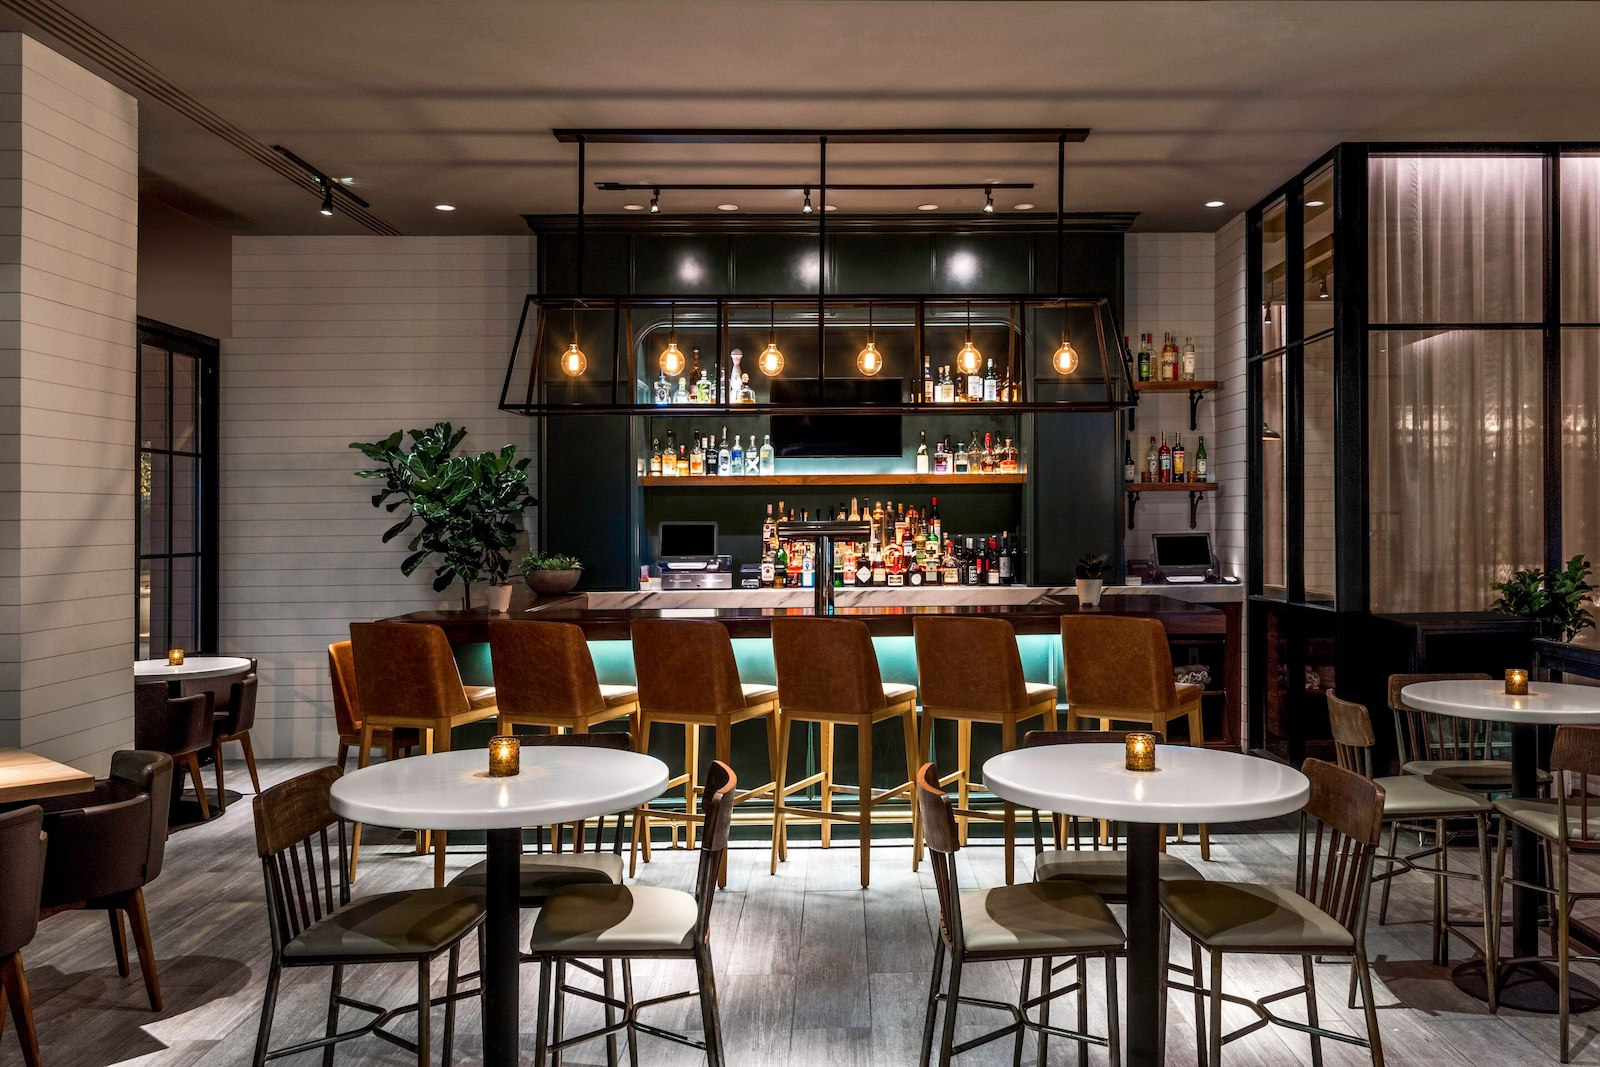 Image of Corrine Restaurant at Le Meridien in Denver, Colorado